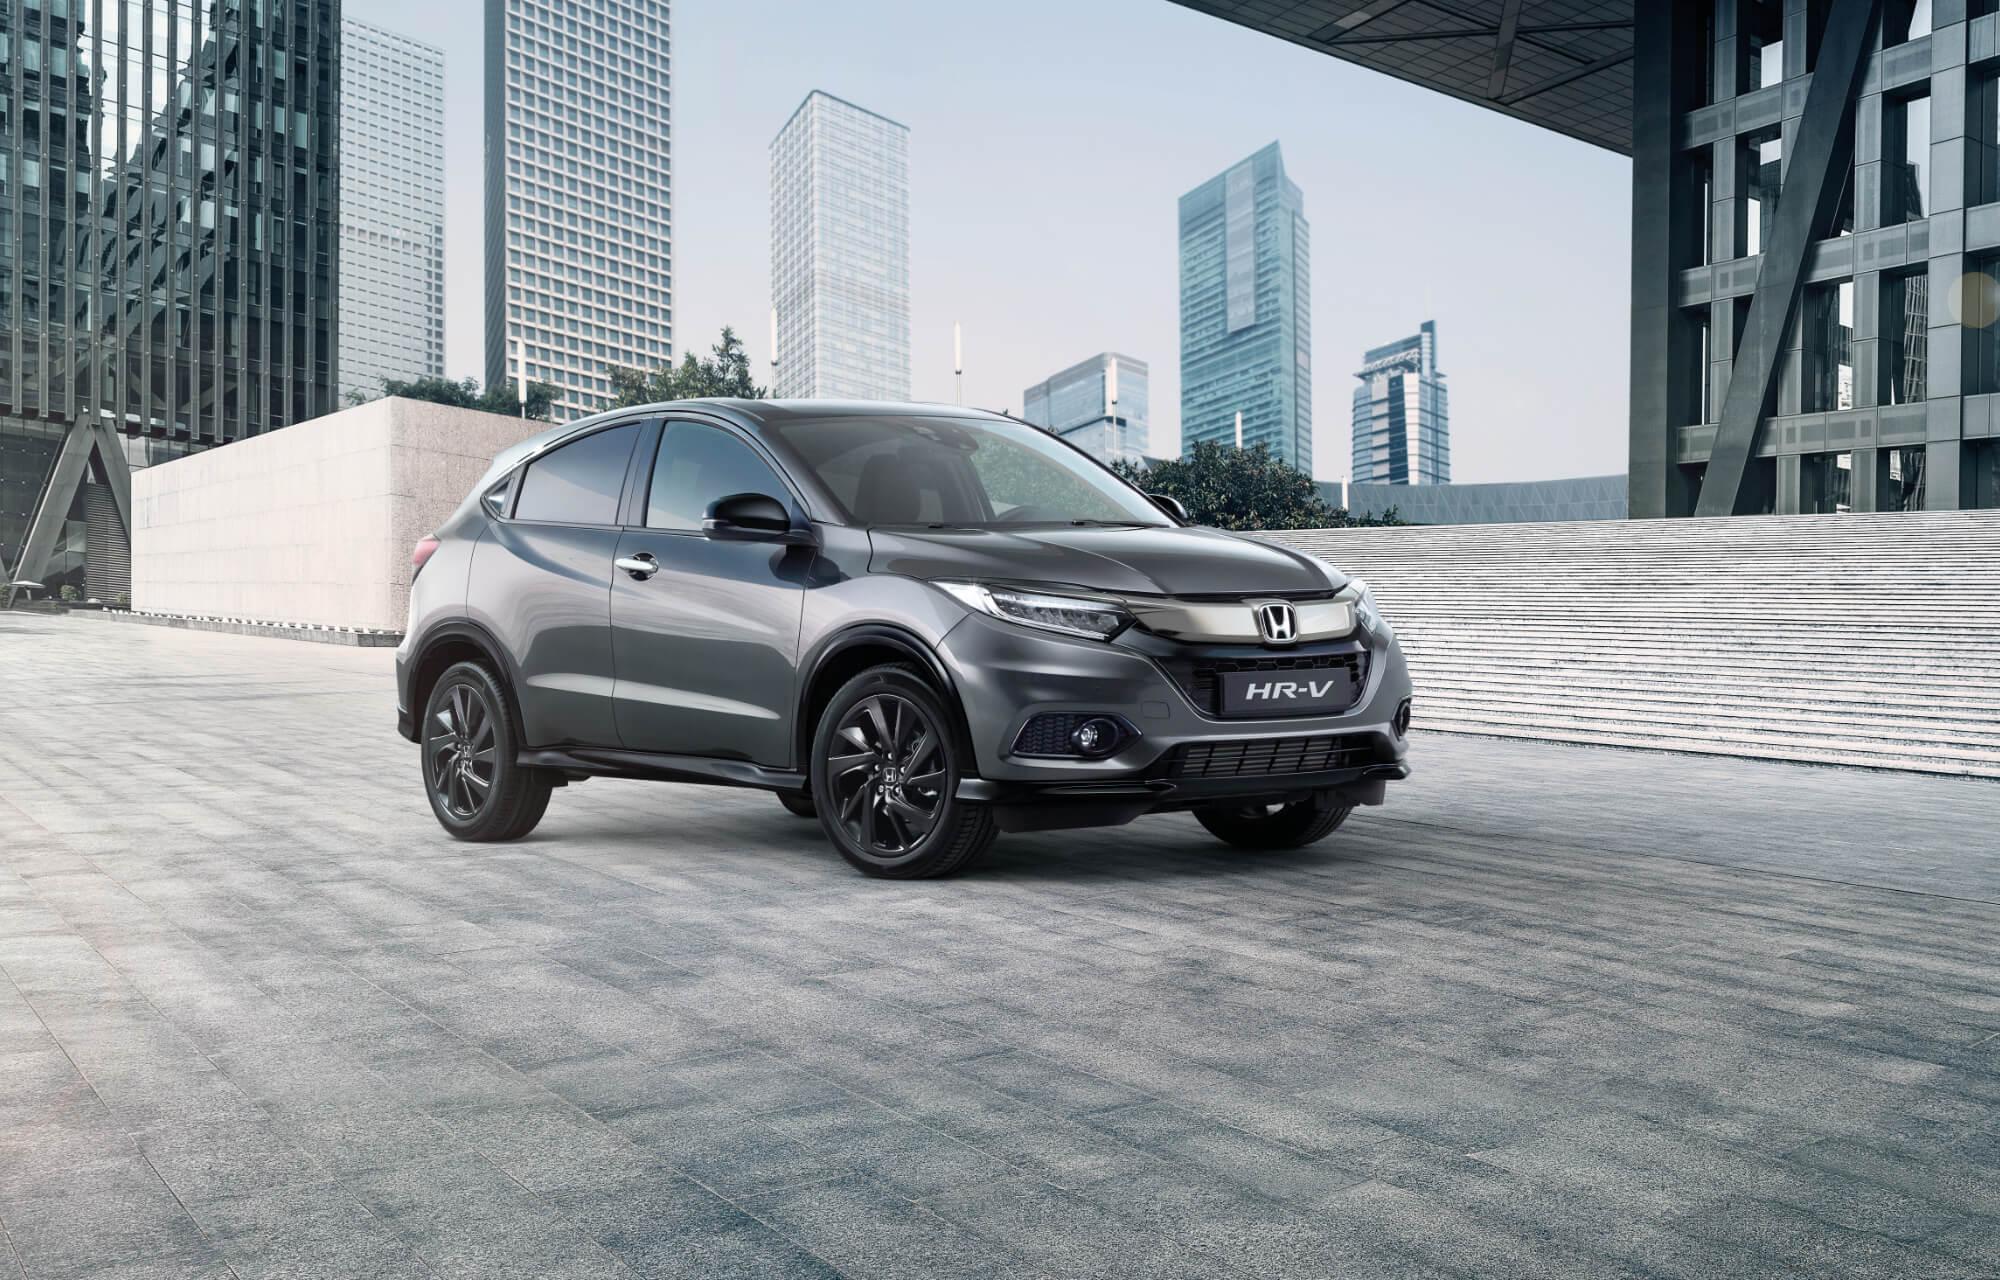 Order your new 2020 Honda HR-V today